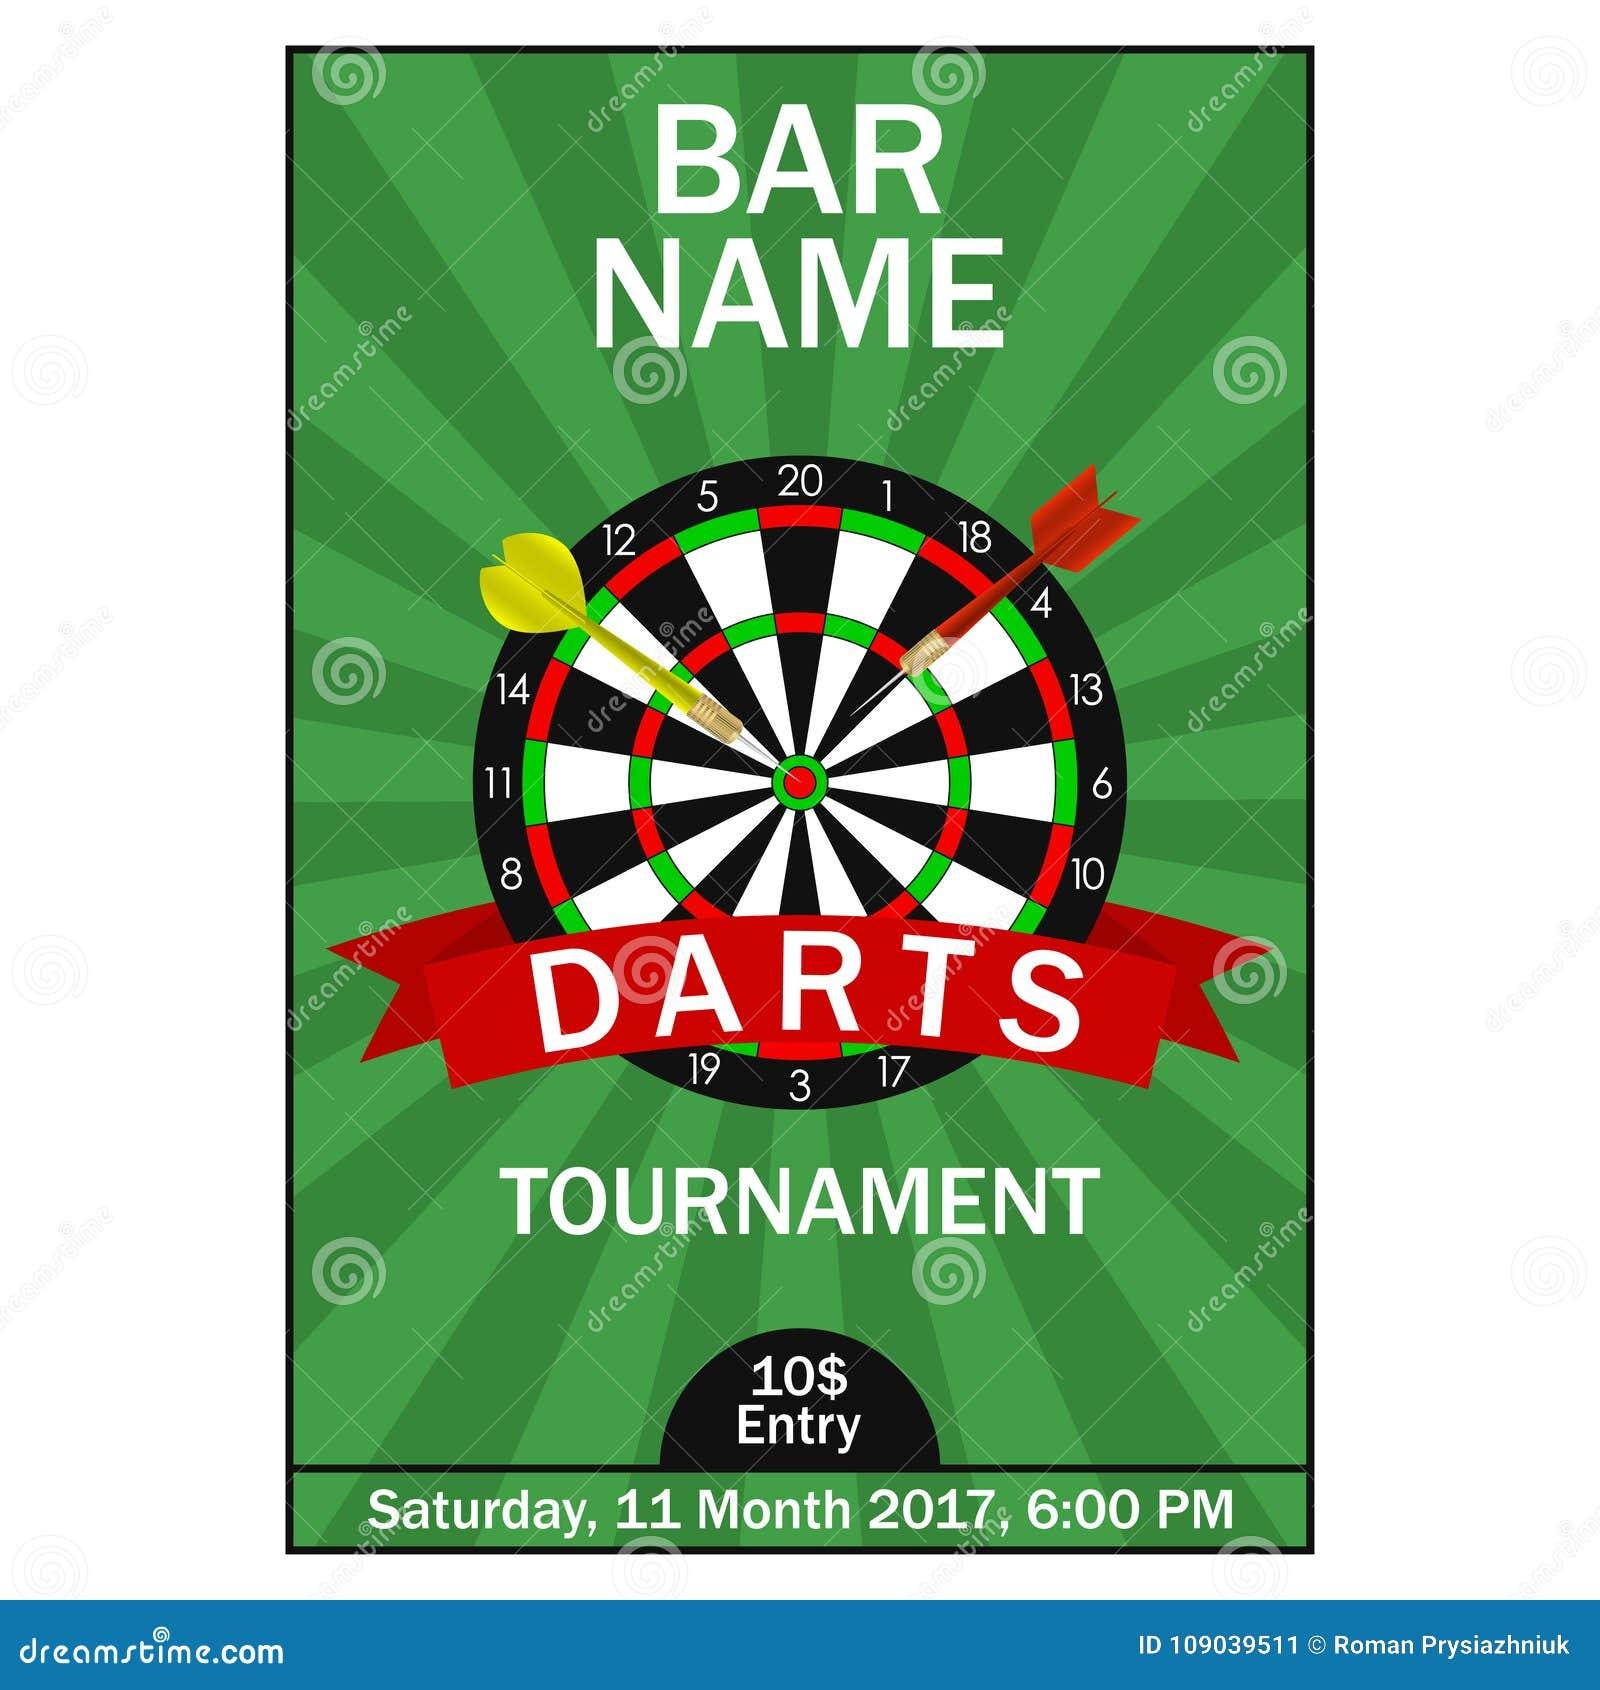 darts tournament poster design template for championship sport